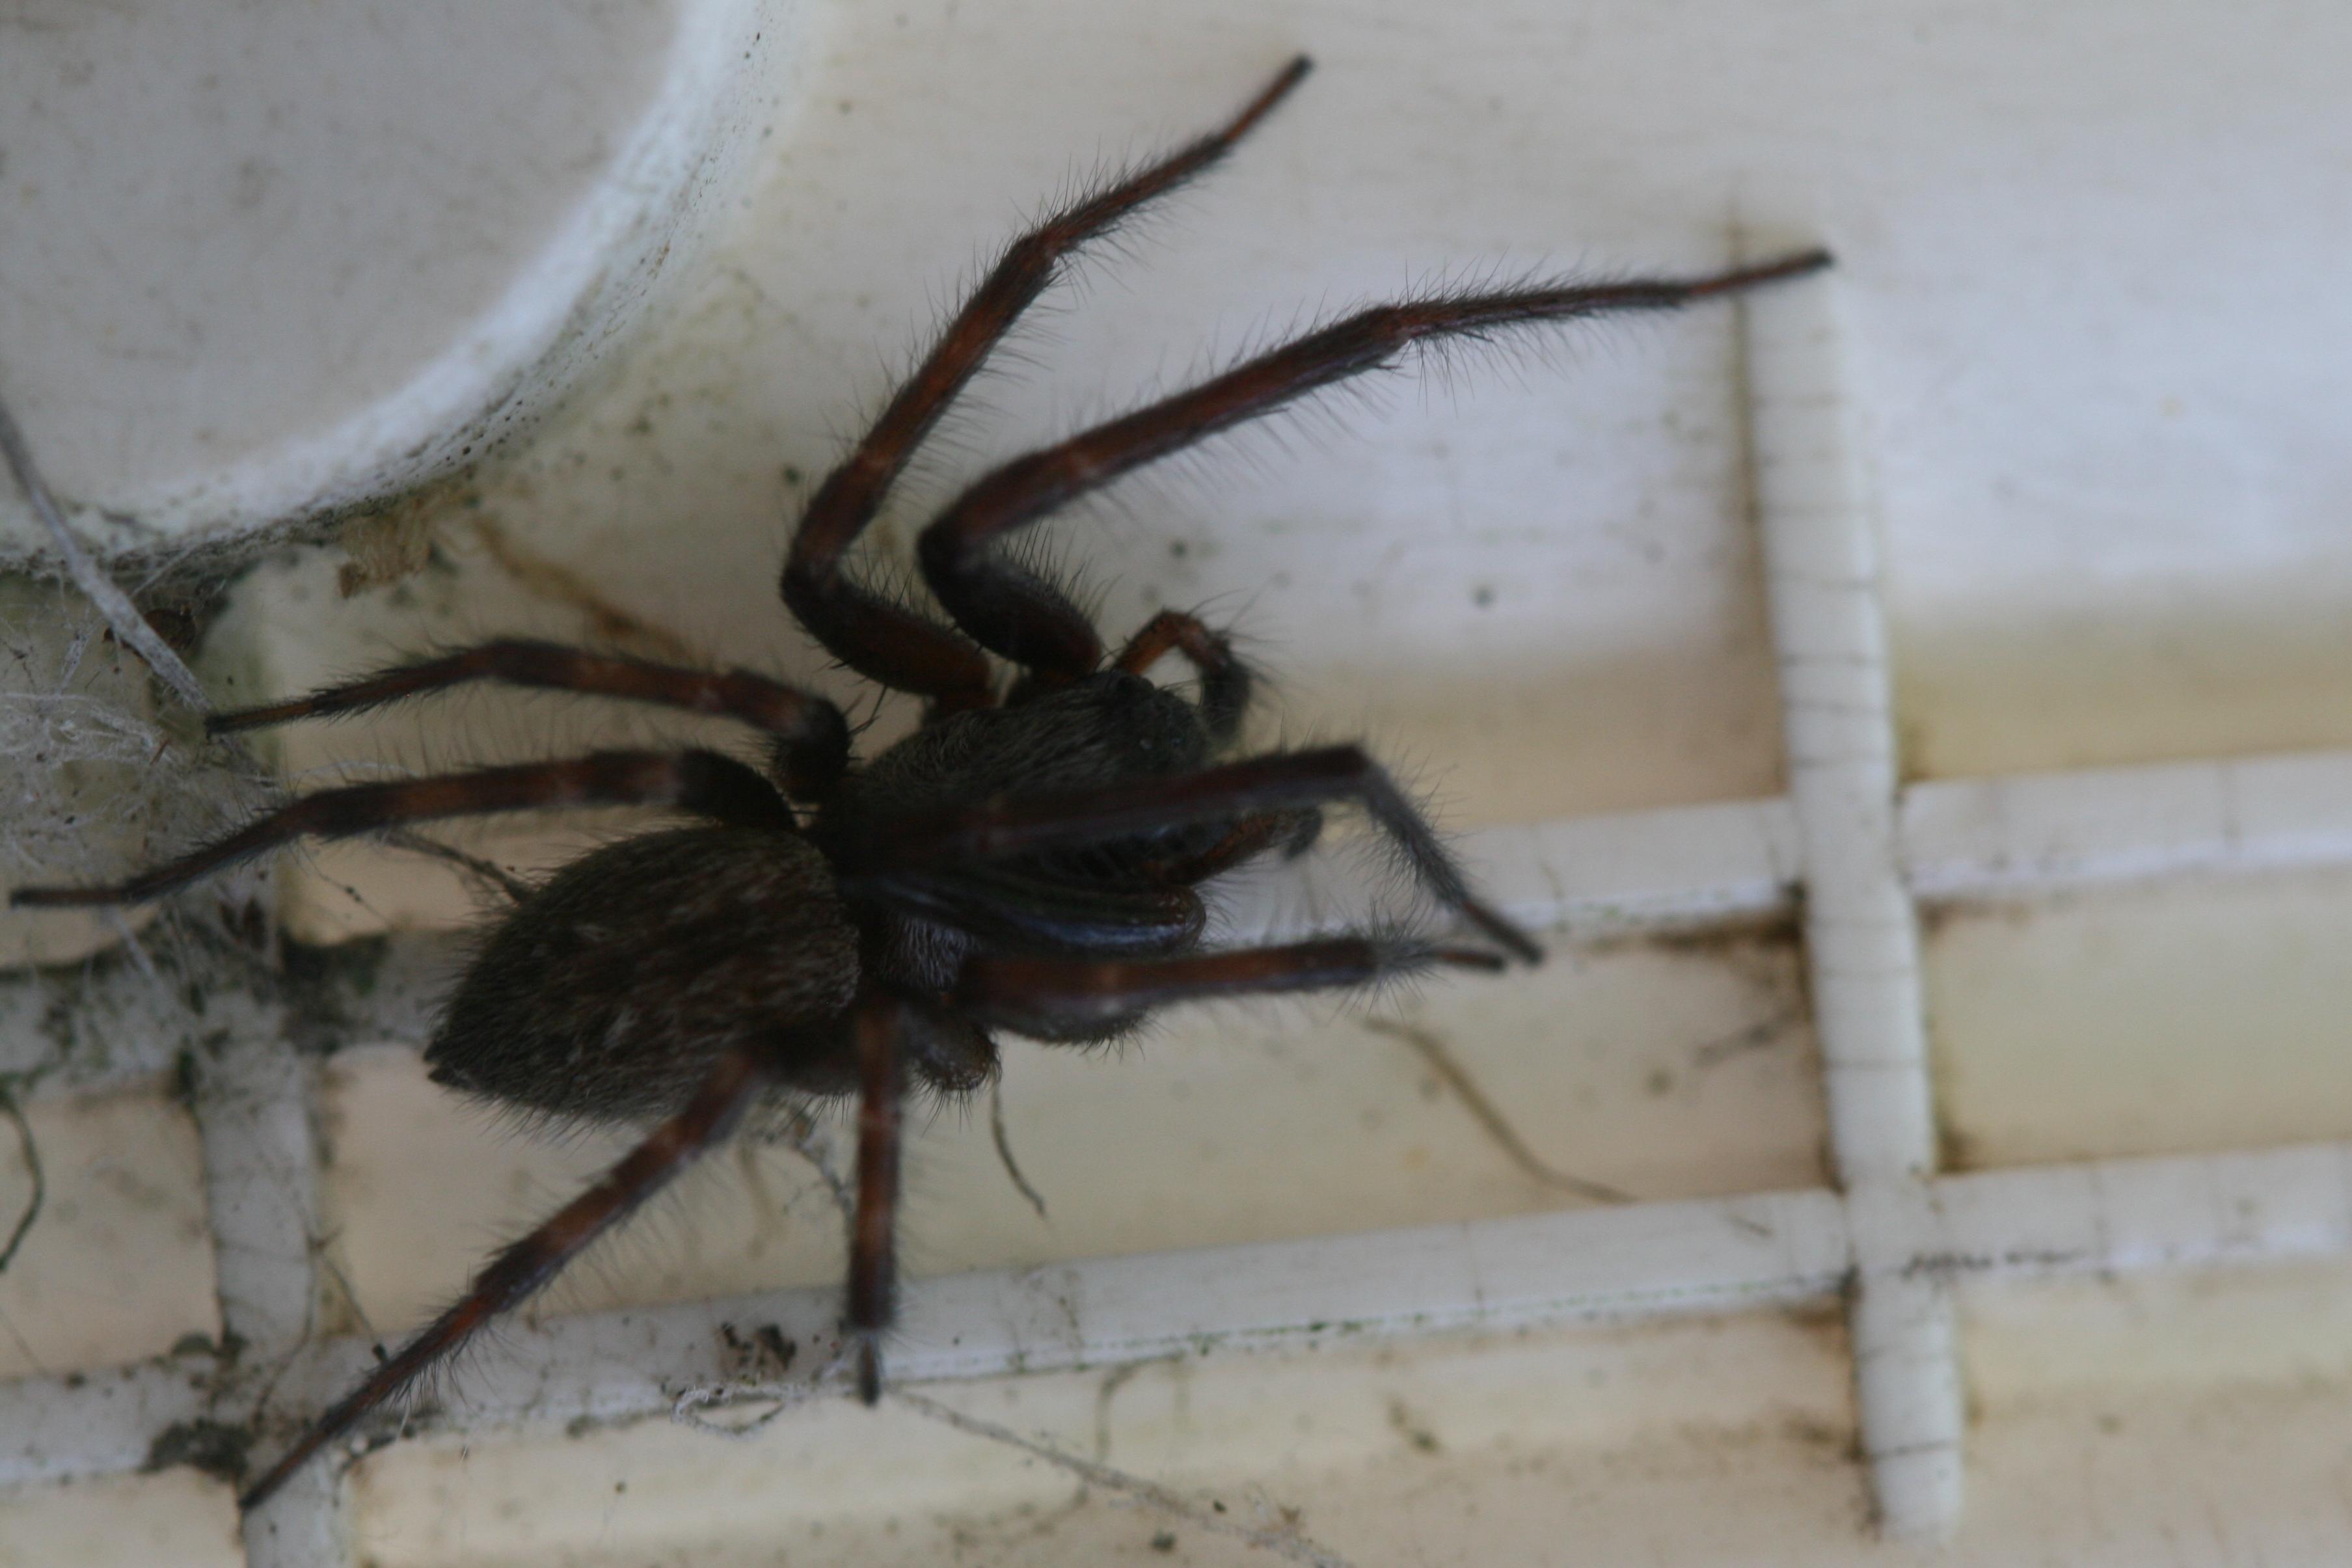 Image of Desid spider